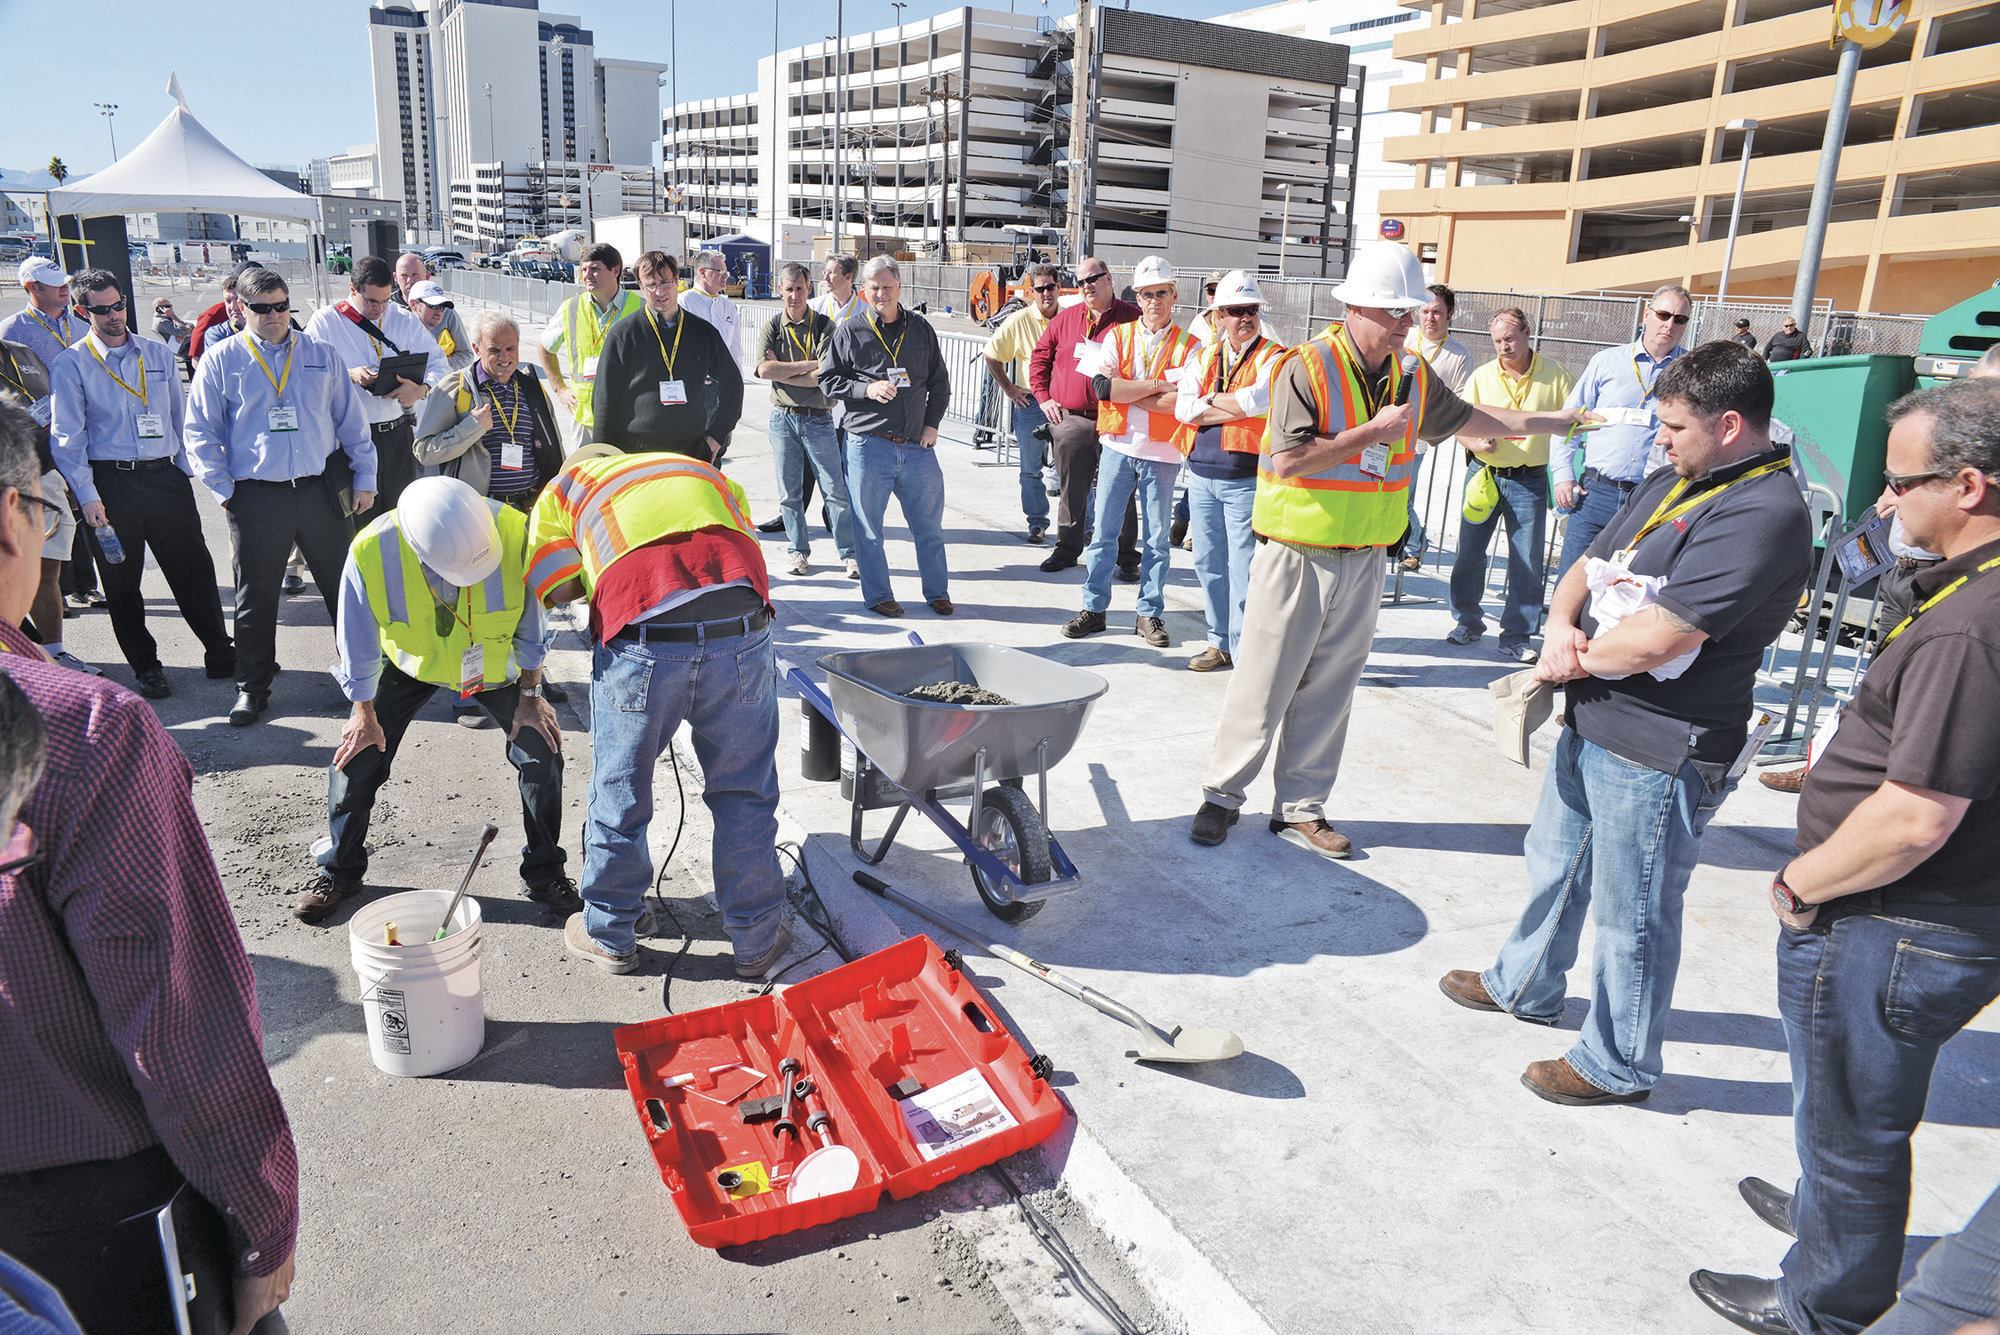 Roller Compacted Concrete Morgan Corp : Rcc live event at world of concrete converts contractors